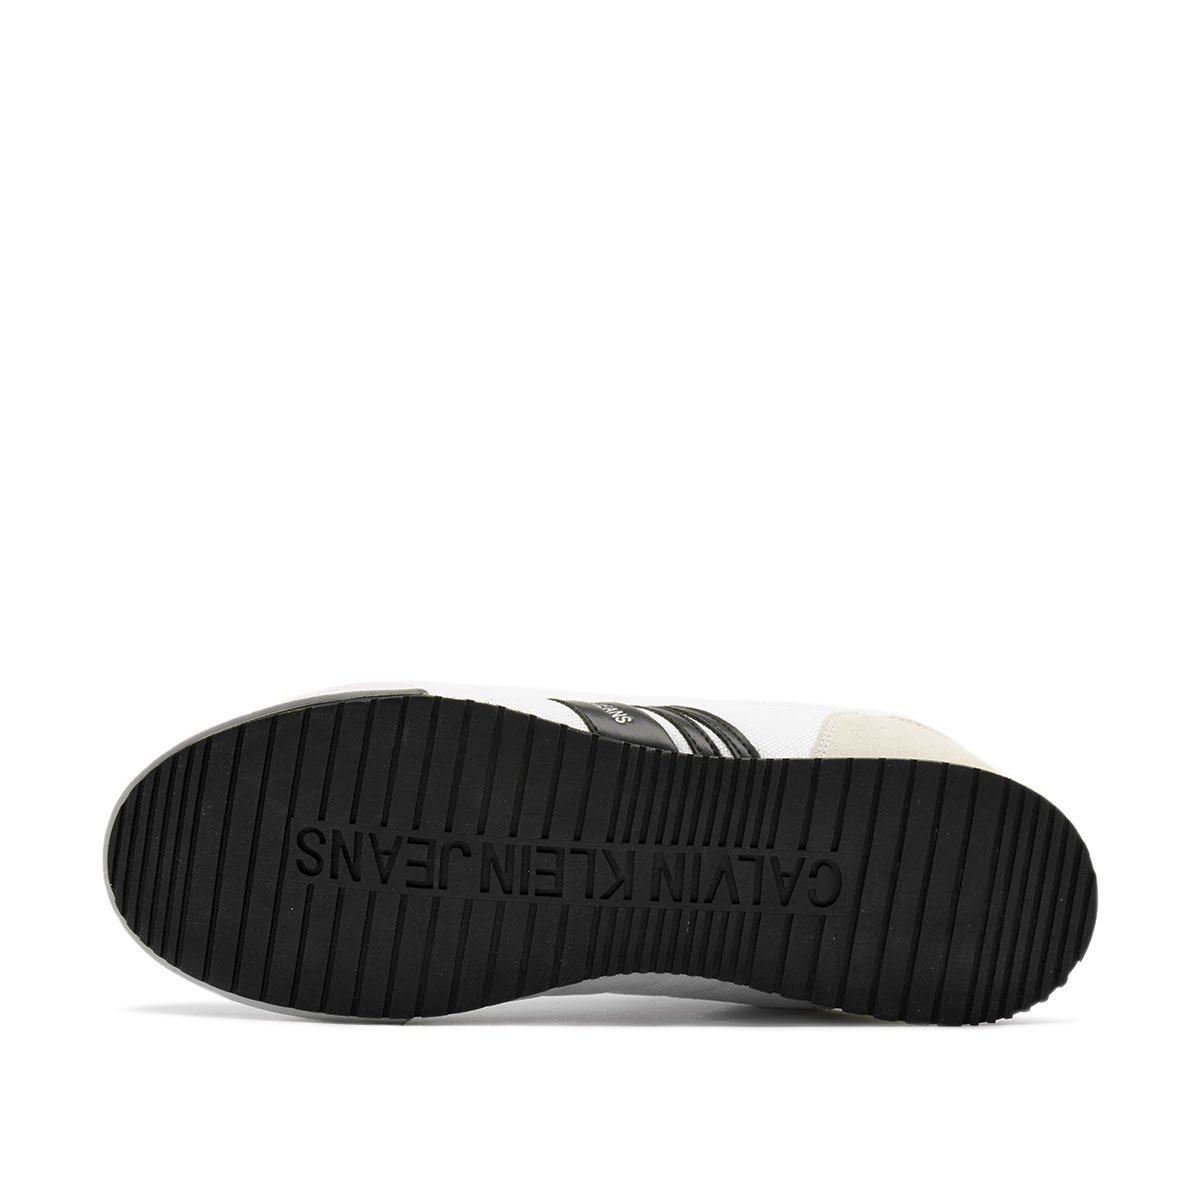 Cavin Klein Low Profile Sneaker Lace Up